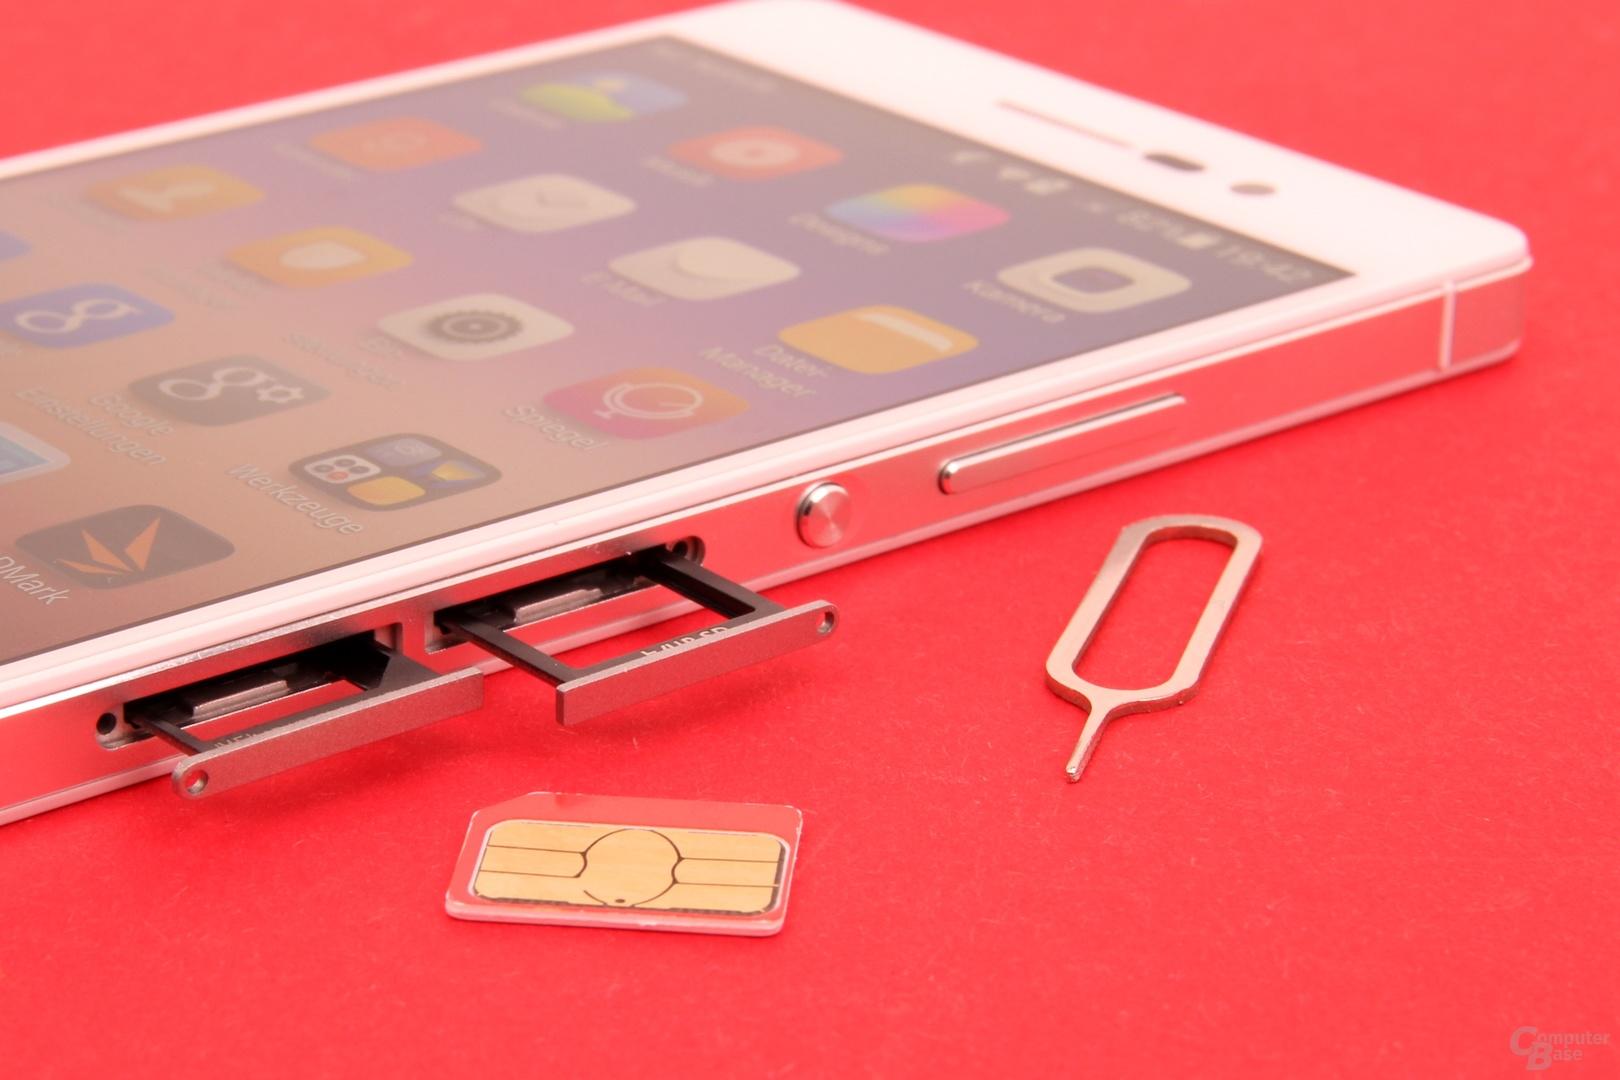 Fächer für Micro-SIM- und microSD-Karte